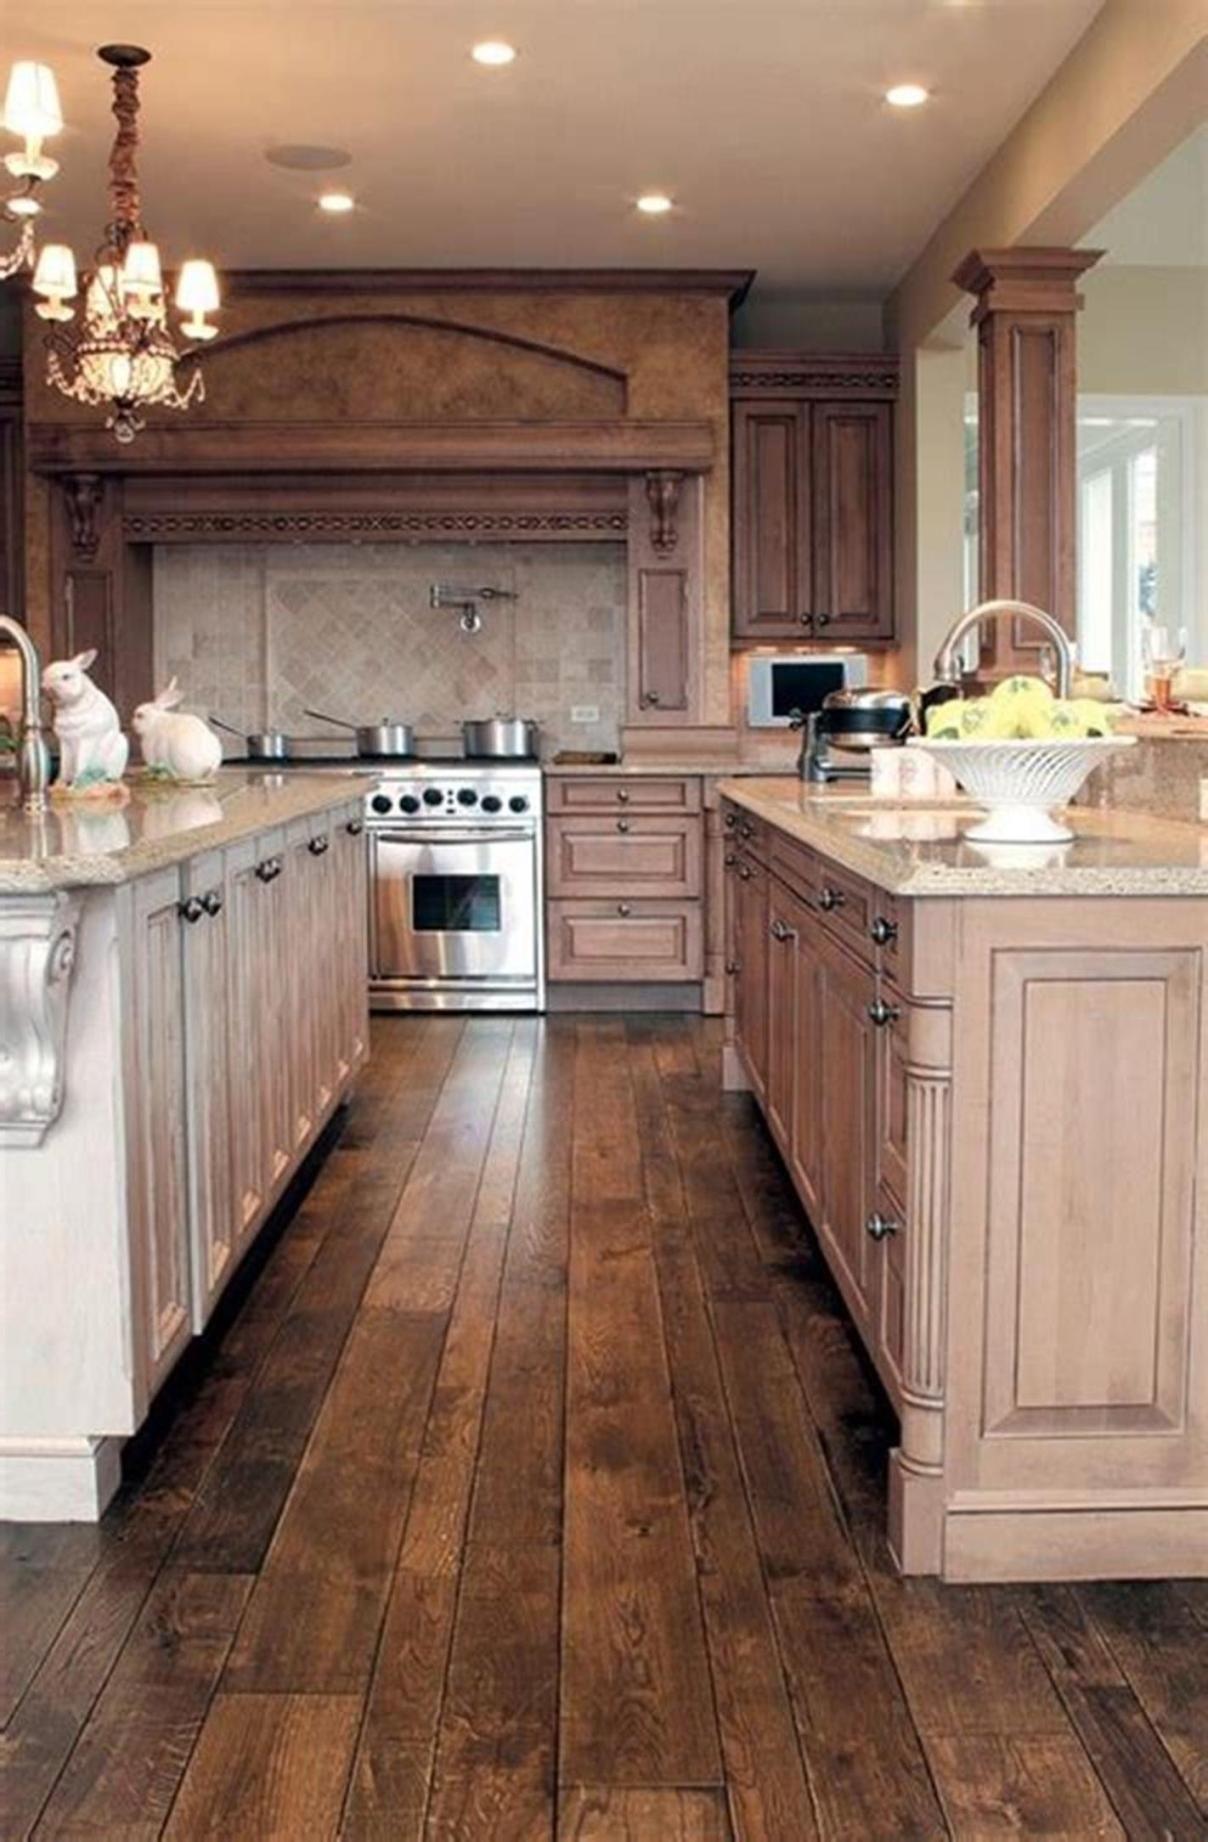 trendy kitchen design and decor ideas you will love also galley kitchendesigns designs in rh pinterest